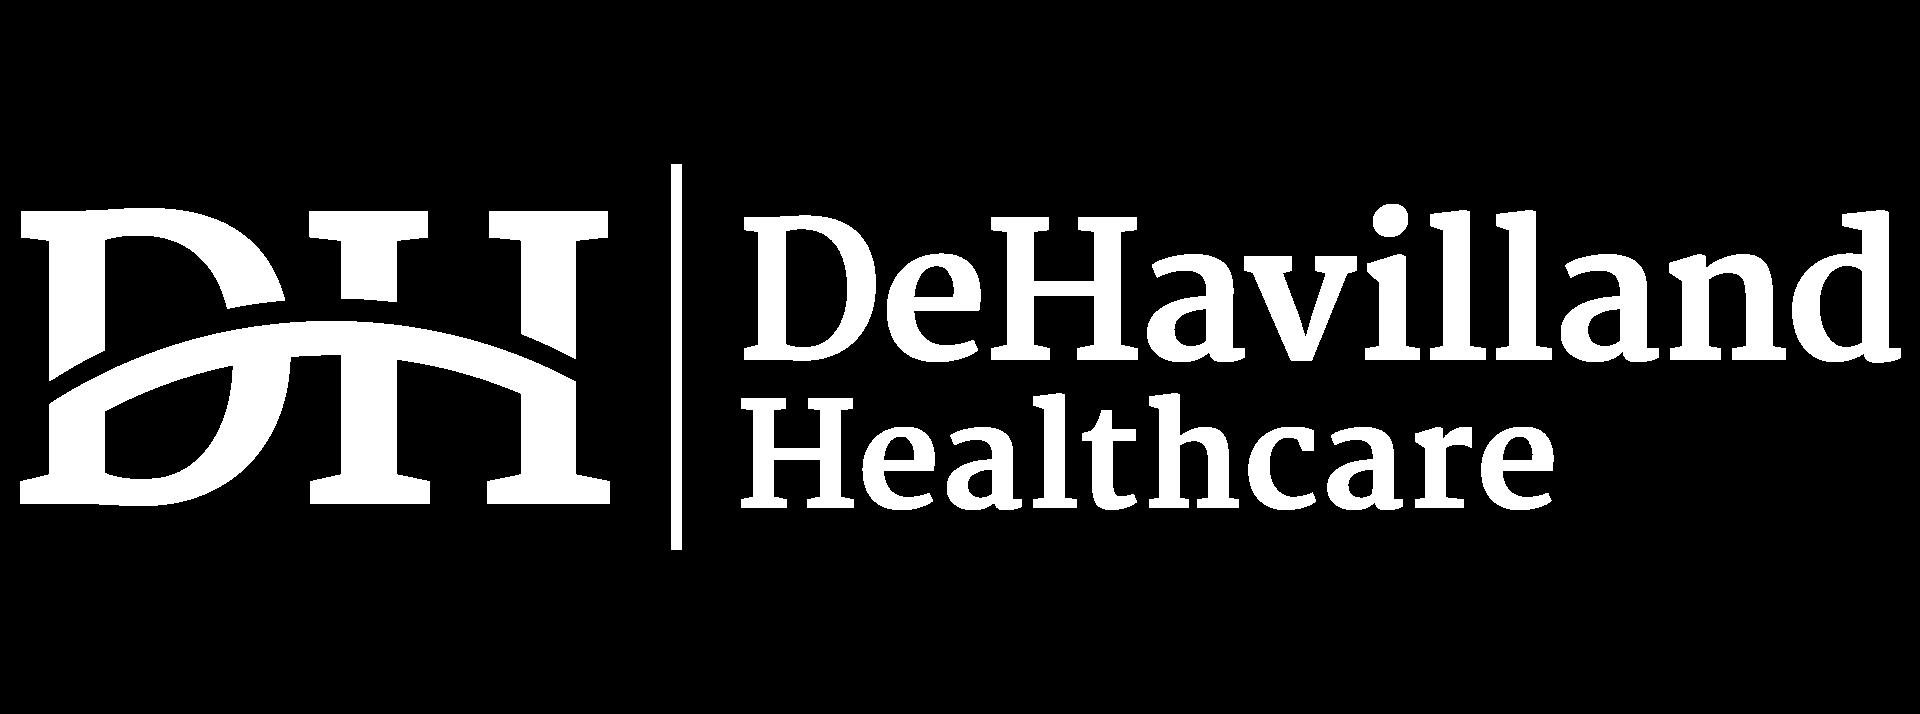 DeHavilland healthcare recruitment logo dark theme